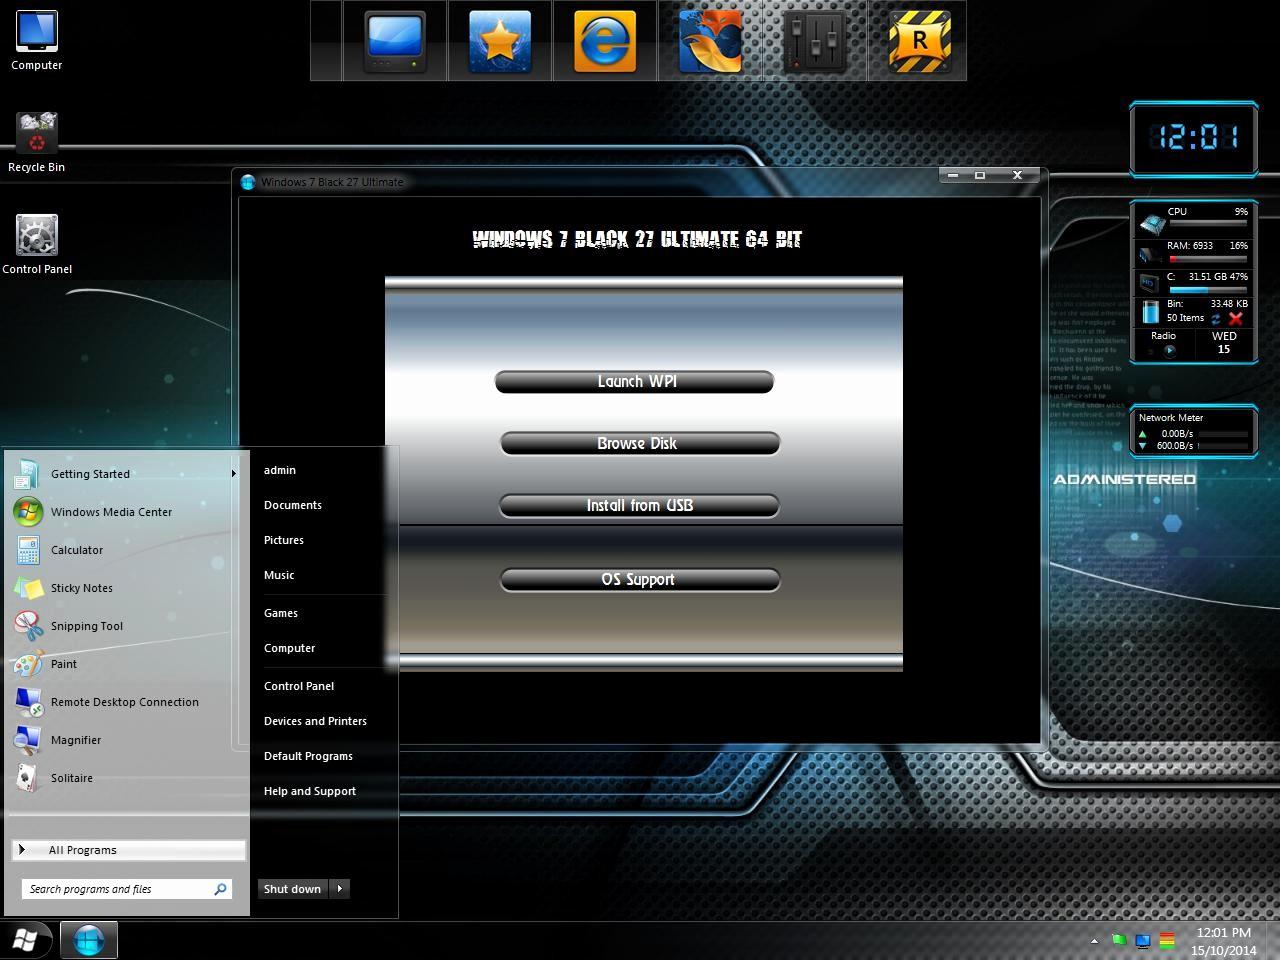 Microsoft Office Essentials Free Download Lovely Microsoft Windows Xp 7 Free Download Full Version Calriload